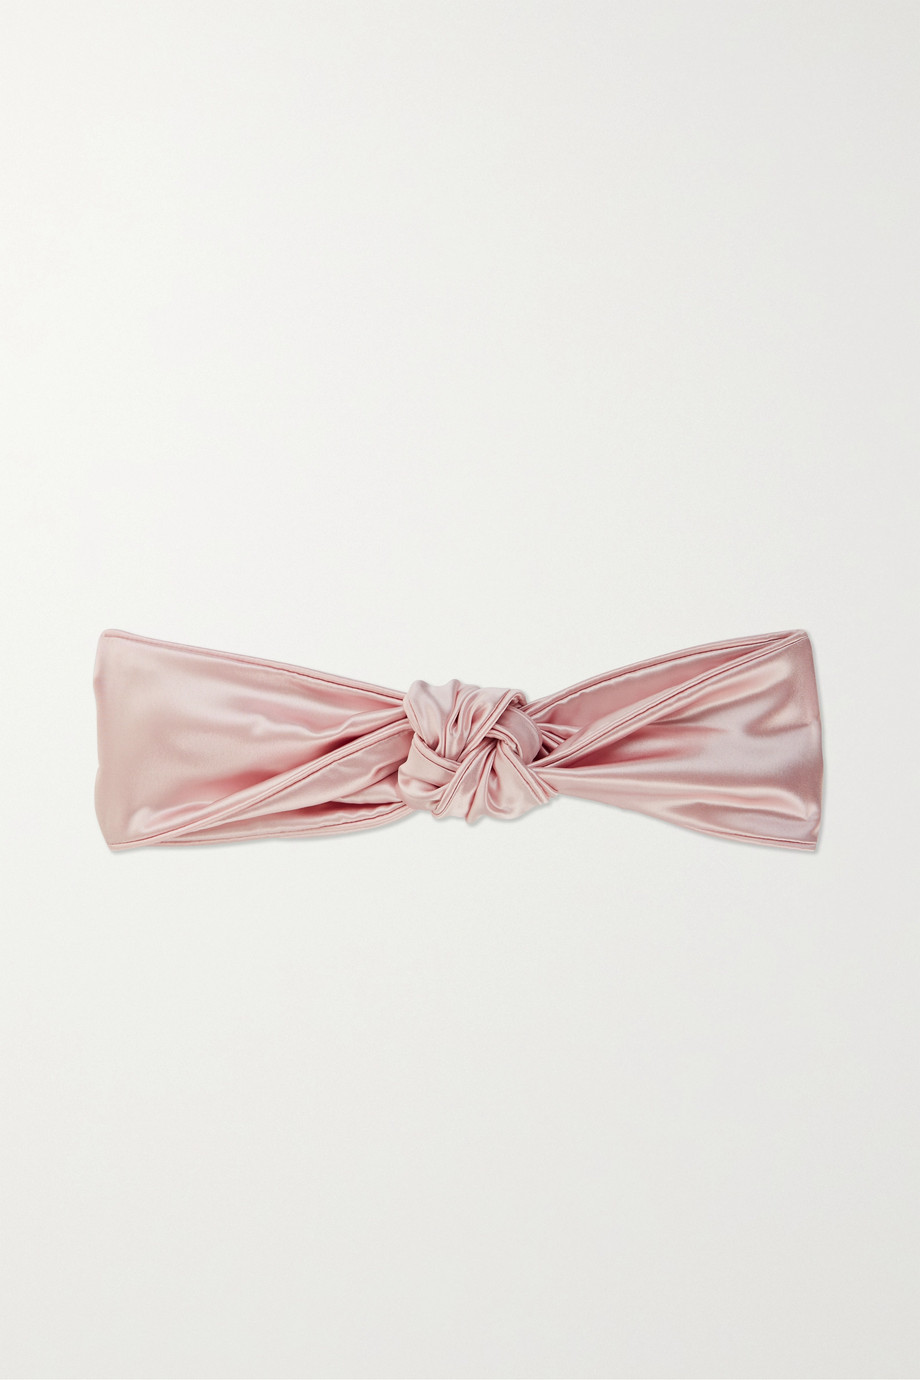 Slip Knot silk headband